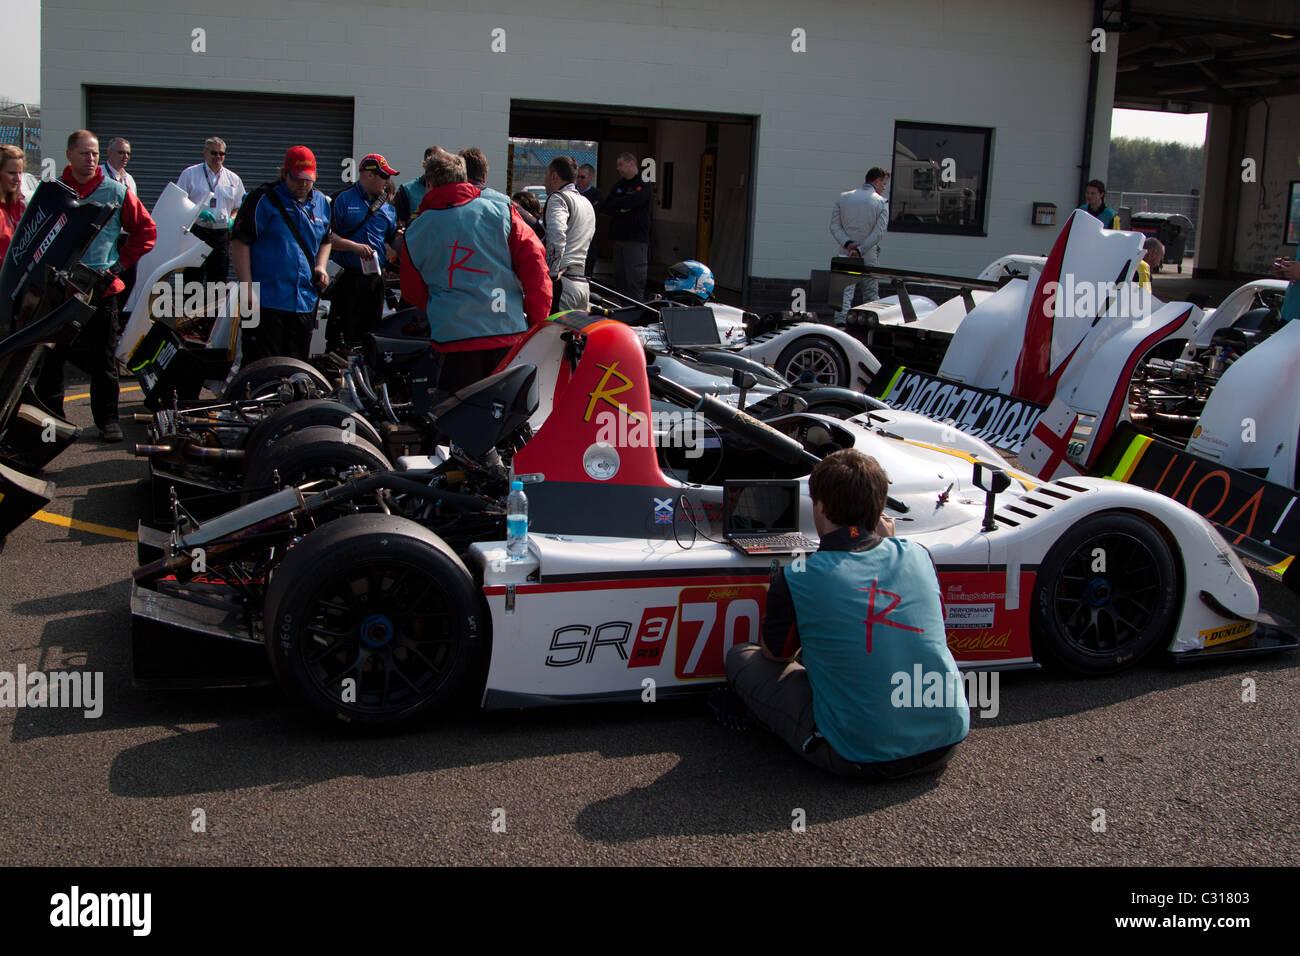 Motorsport at Silverstone, England Stock Photo, Royalty Free Image ...